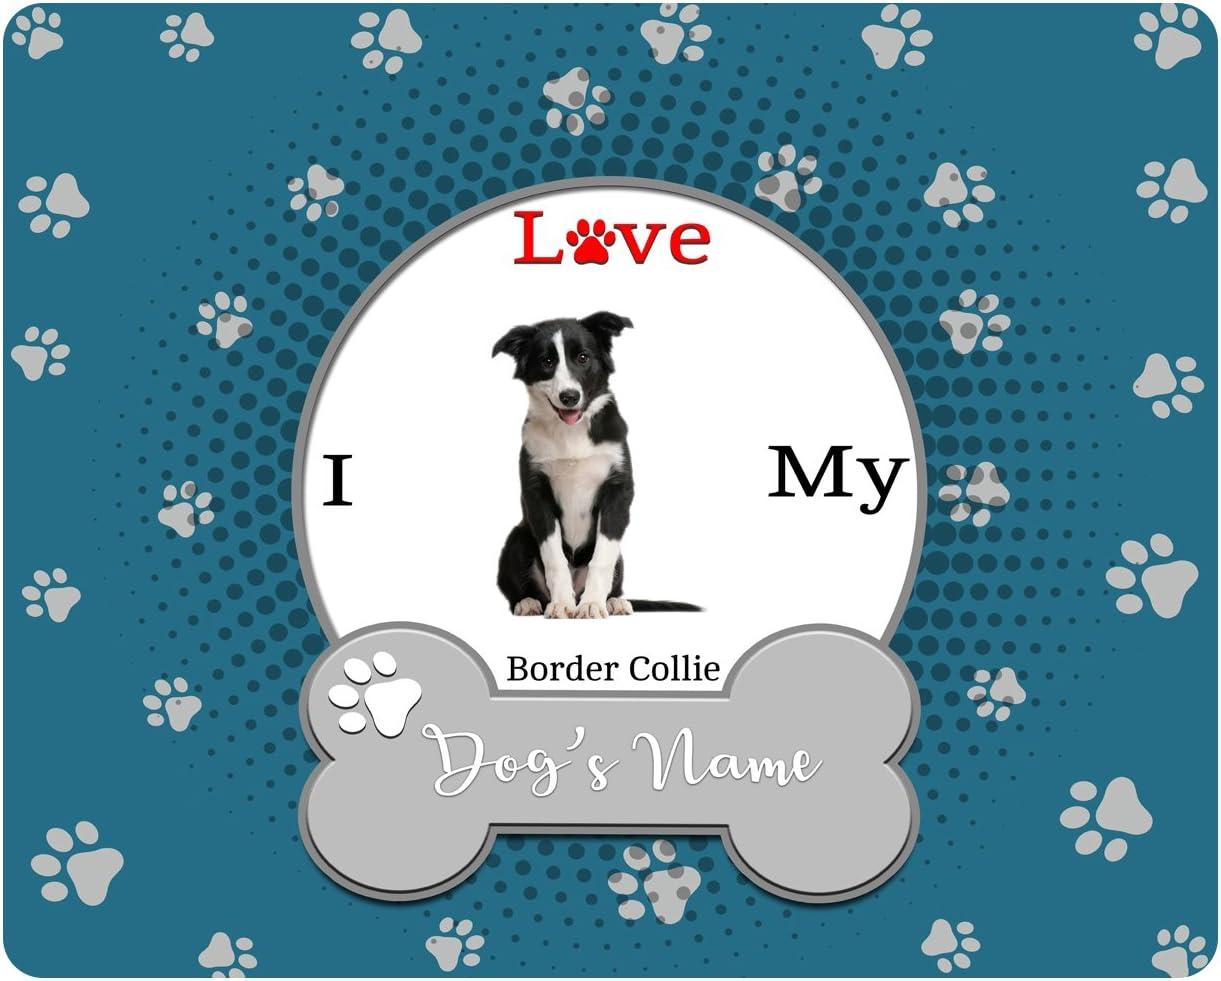 BleuReign(TM) Personalized Custom Name I Love My Dog Border Collie Square Refrigerator Fridge Magnet